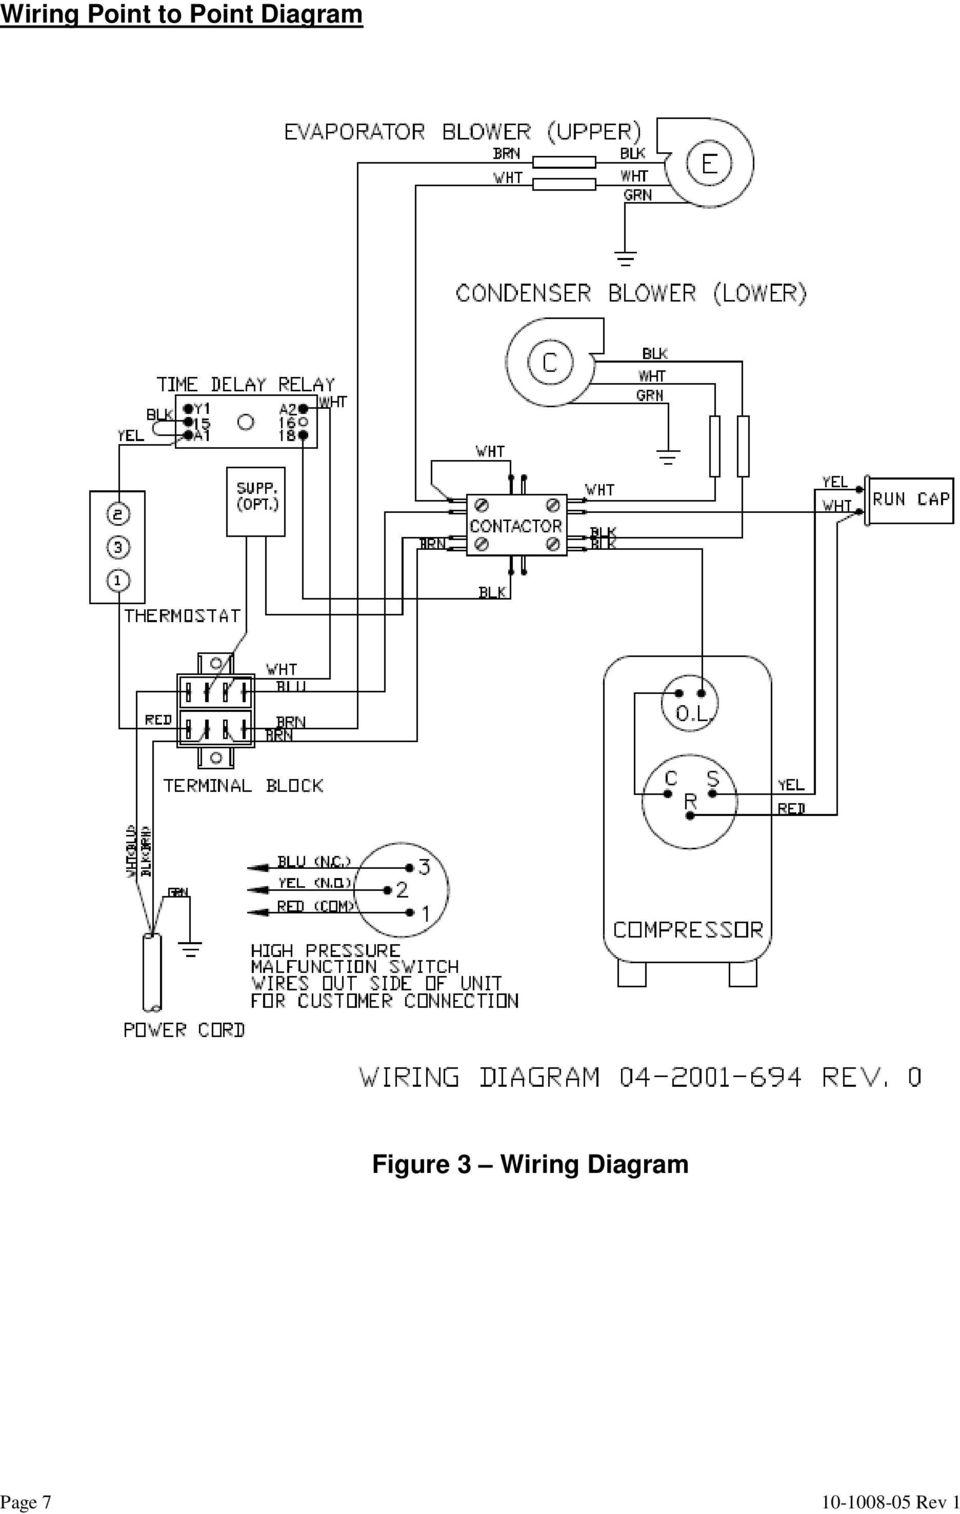 medium resolution of 9 service data lb16 series component list part description part number blower motor condenser blower motor evaporator capacitor condenser blower